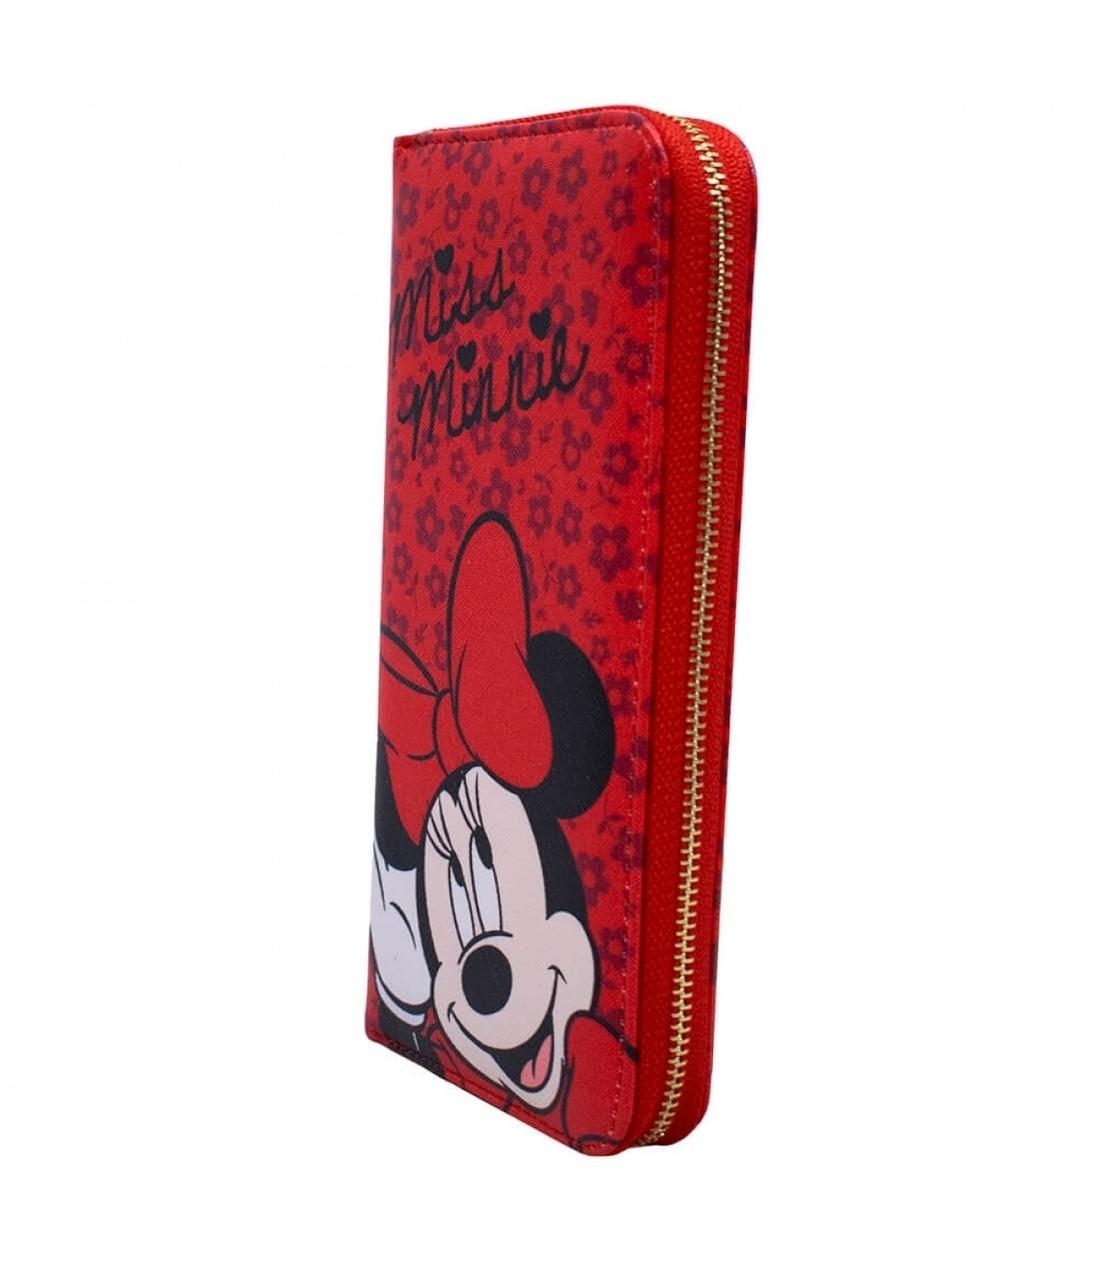 Carteira Miss Minnie Mouse: Mickey e Minnie Mouse - Disney (Vermelha)